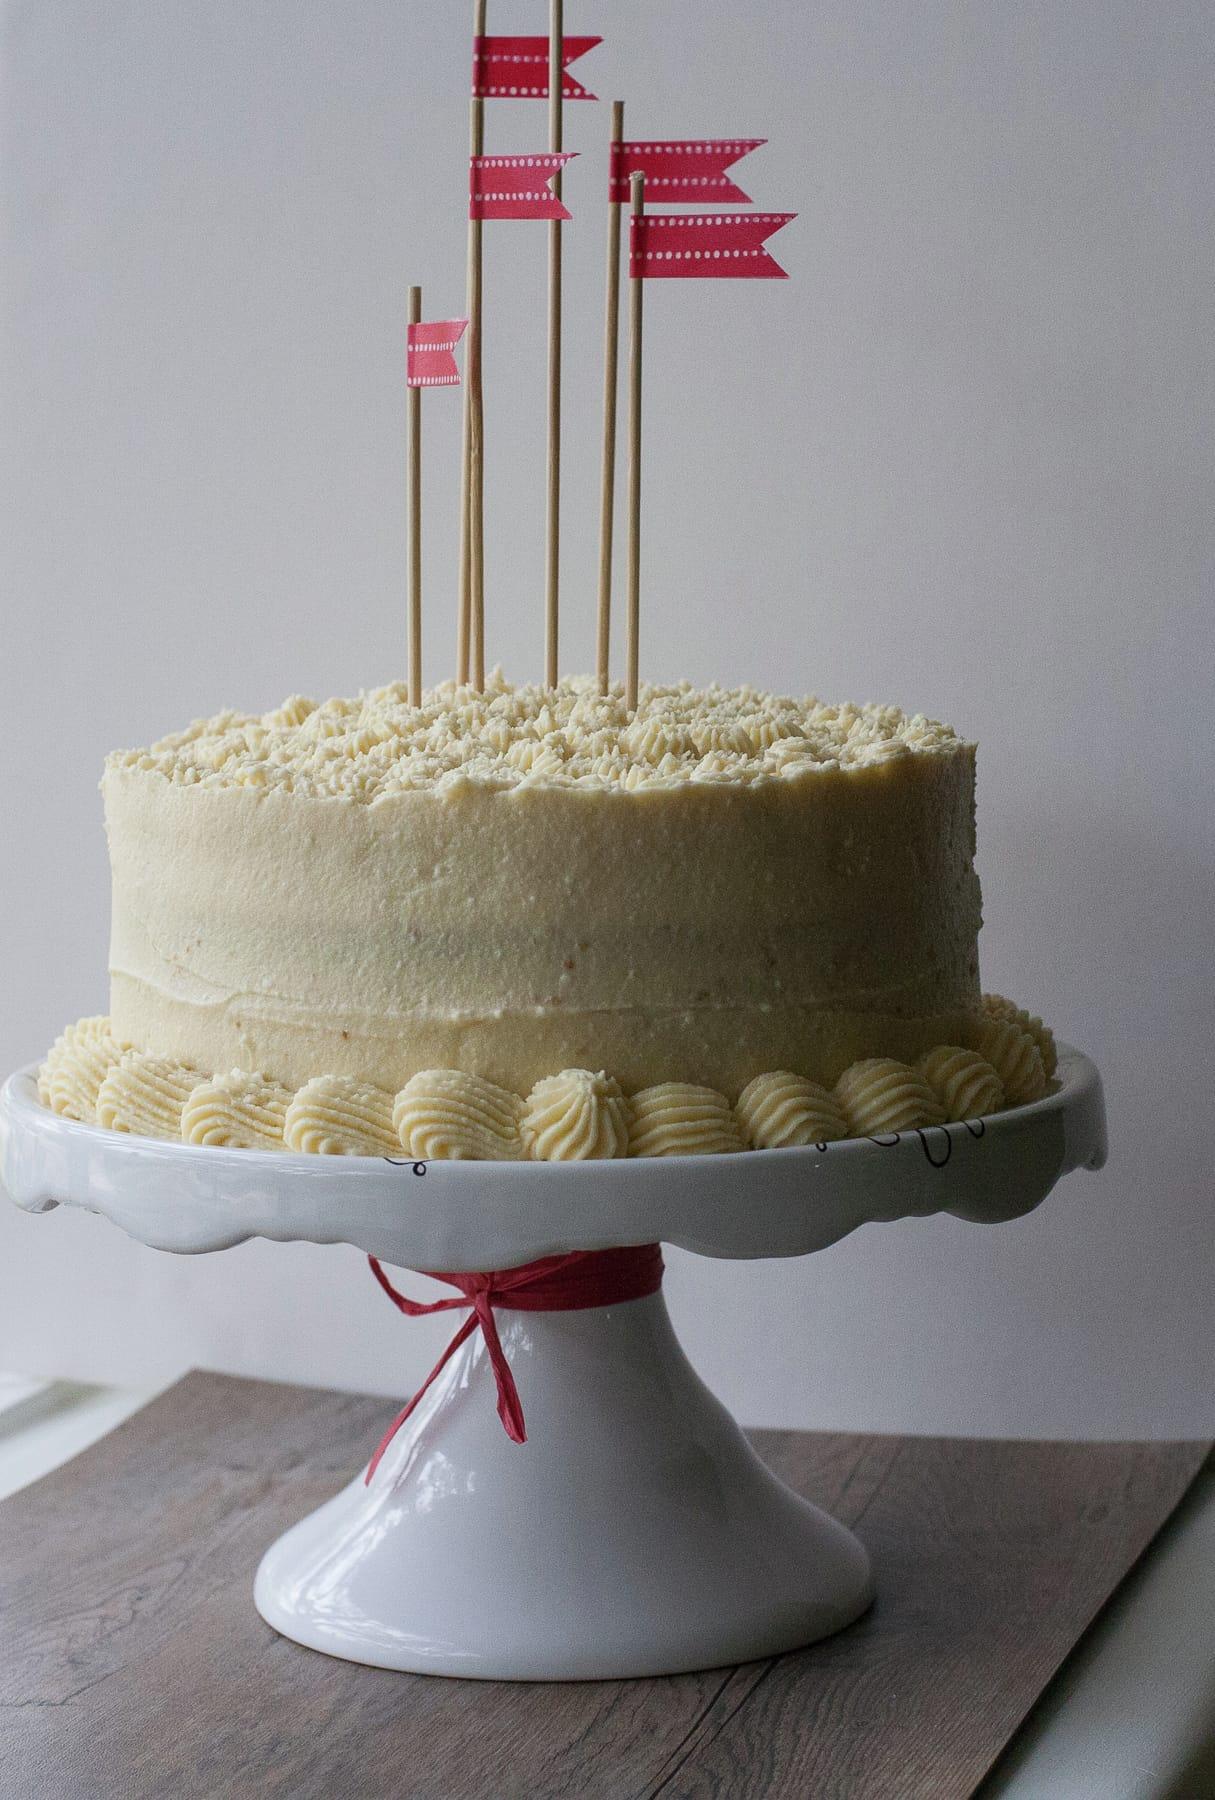 Torta bizcocho vainilla y mermelada